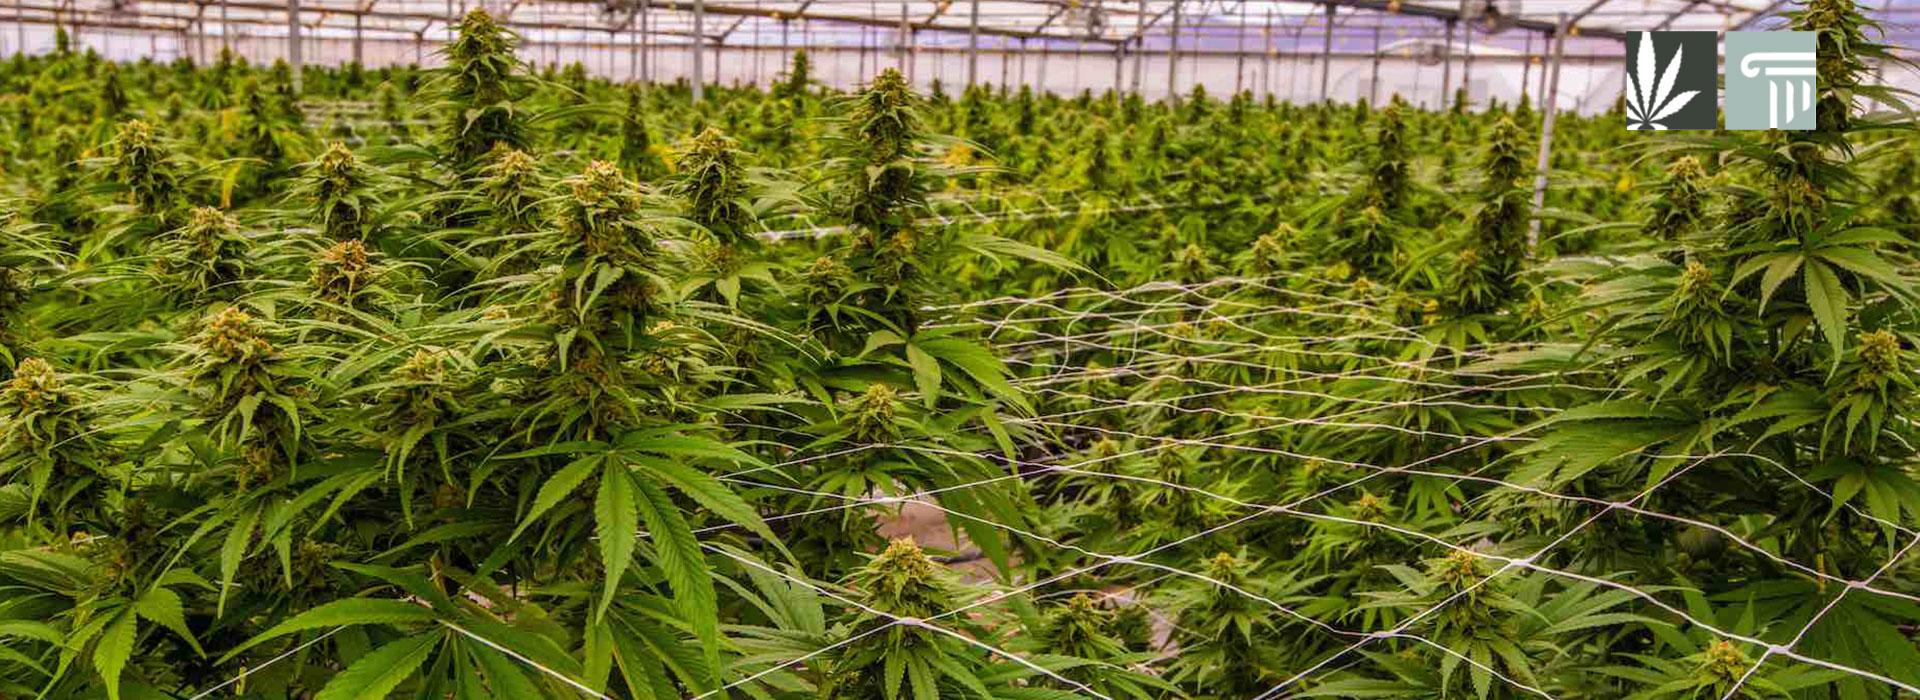 DEA License Marijuana Growing Applicants FDA-Approved Research